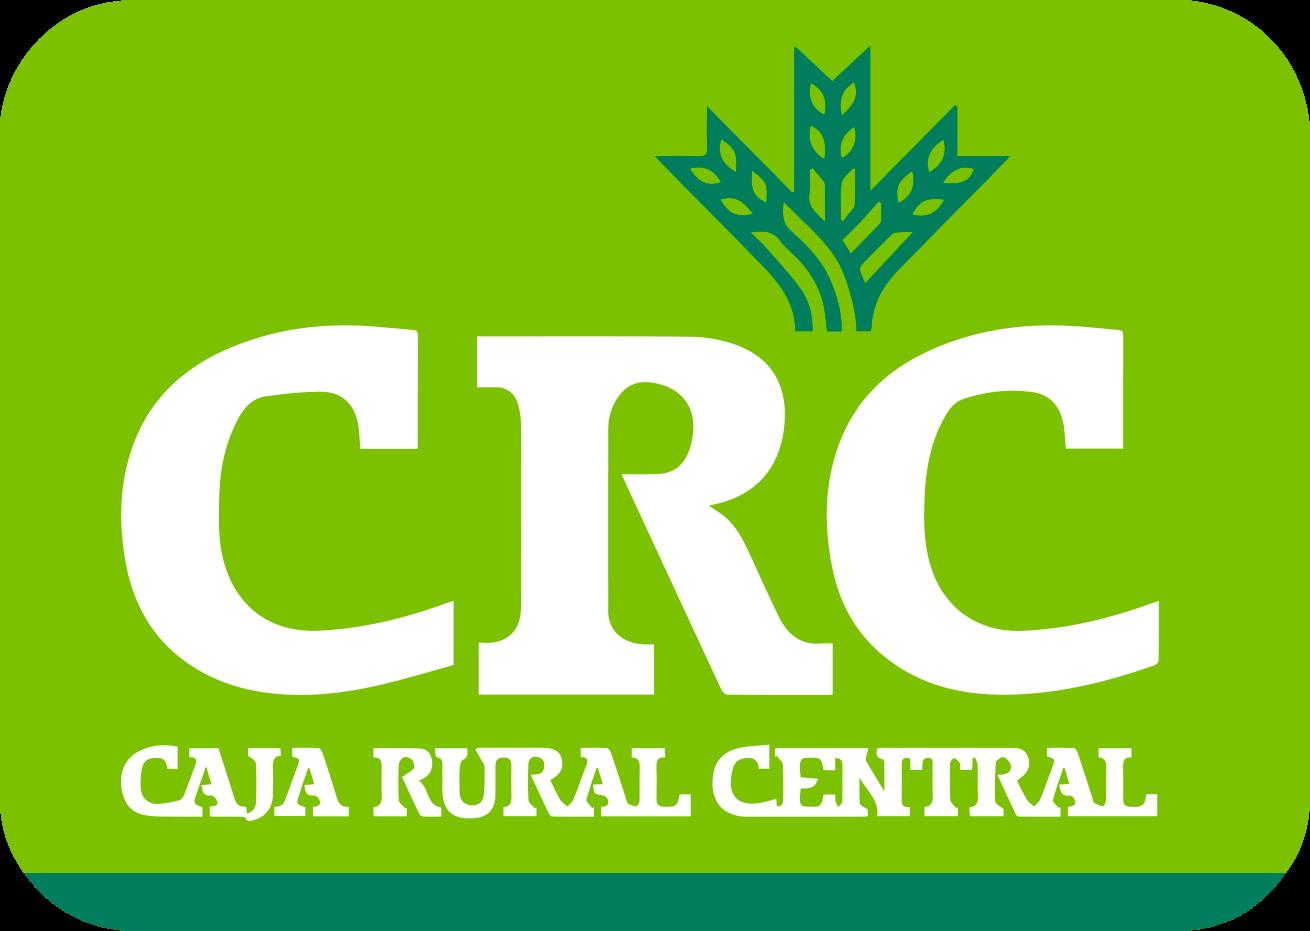 Patrocinadores - Caja Rural Central